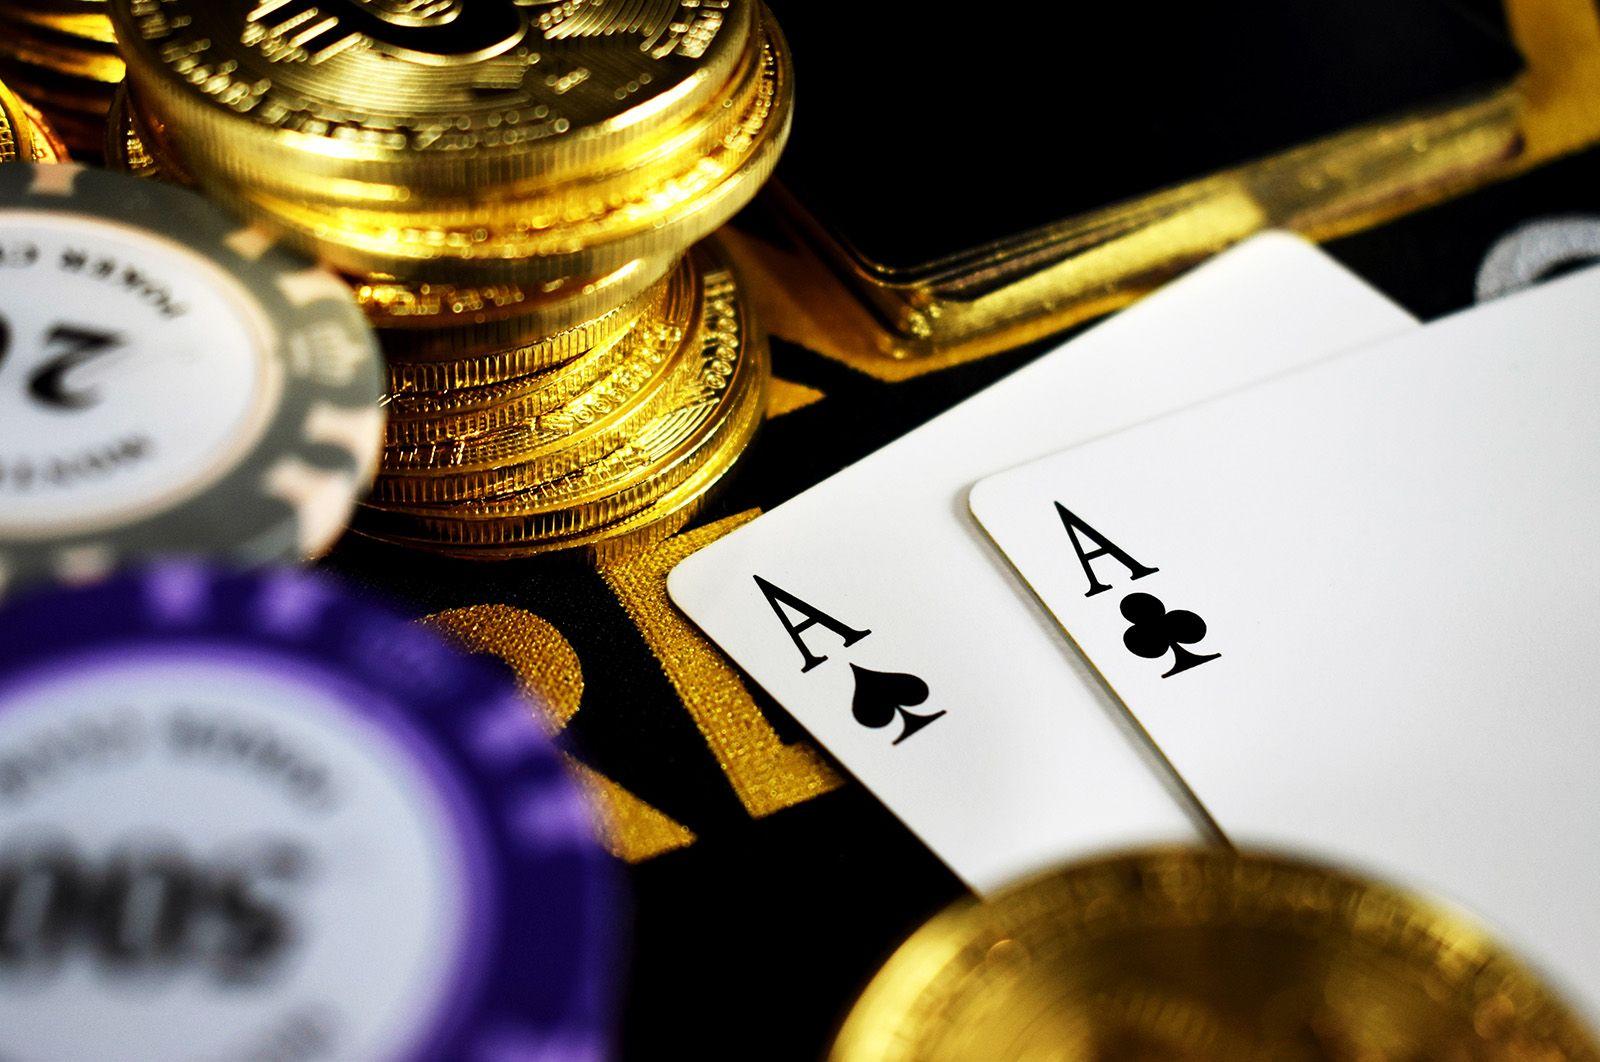 Double Down! in 2020 Online gambling, Poker, Gambling